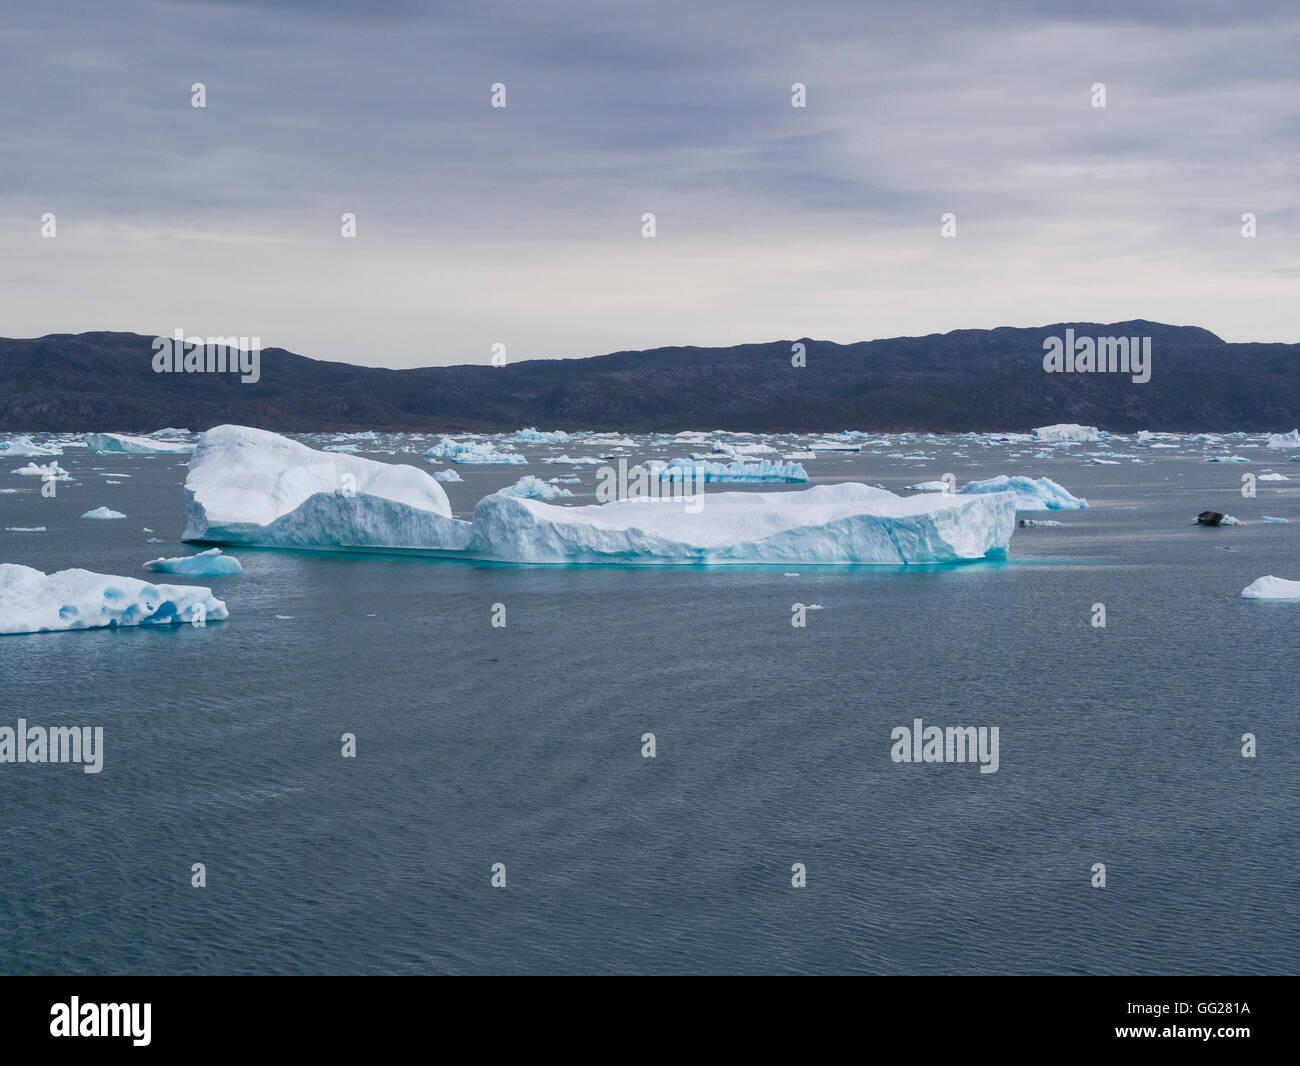 Cruising through icebergs along coast of Labrador Sea South West Greenland - Stock Image